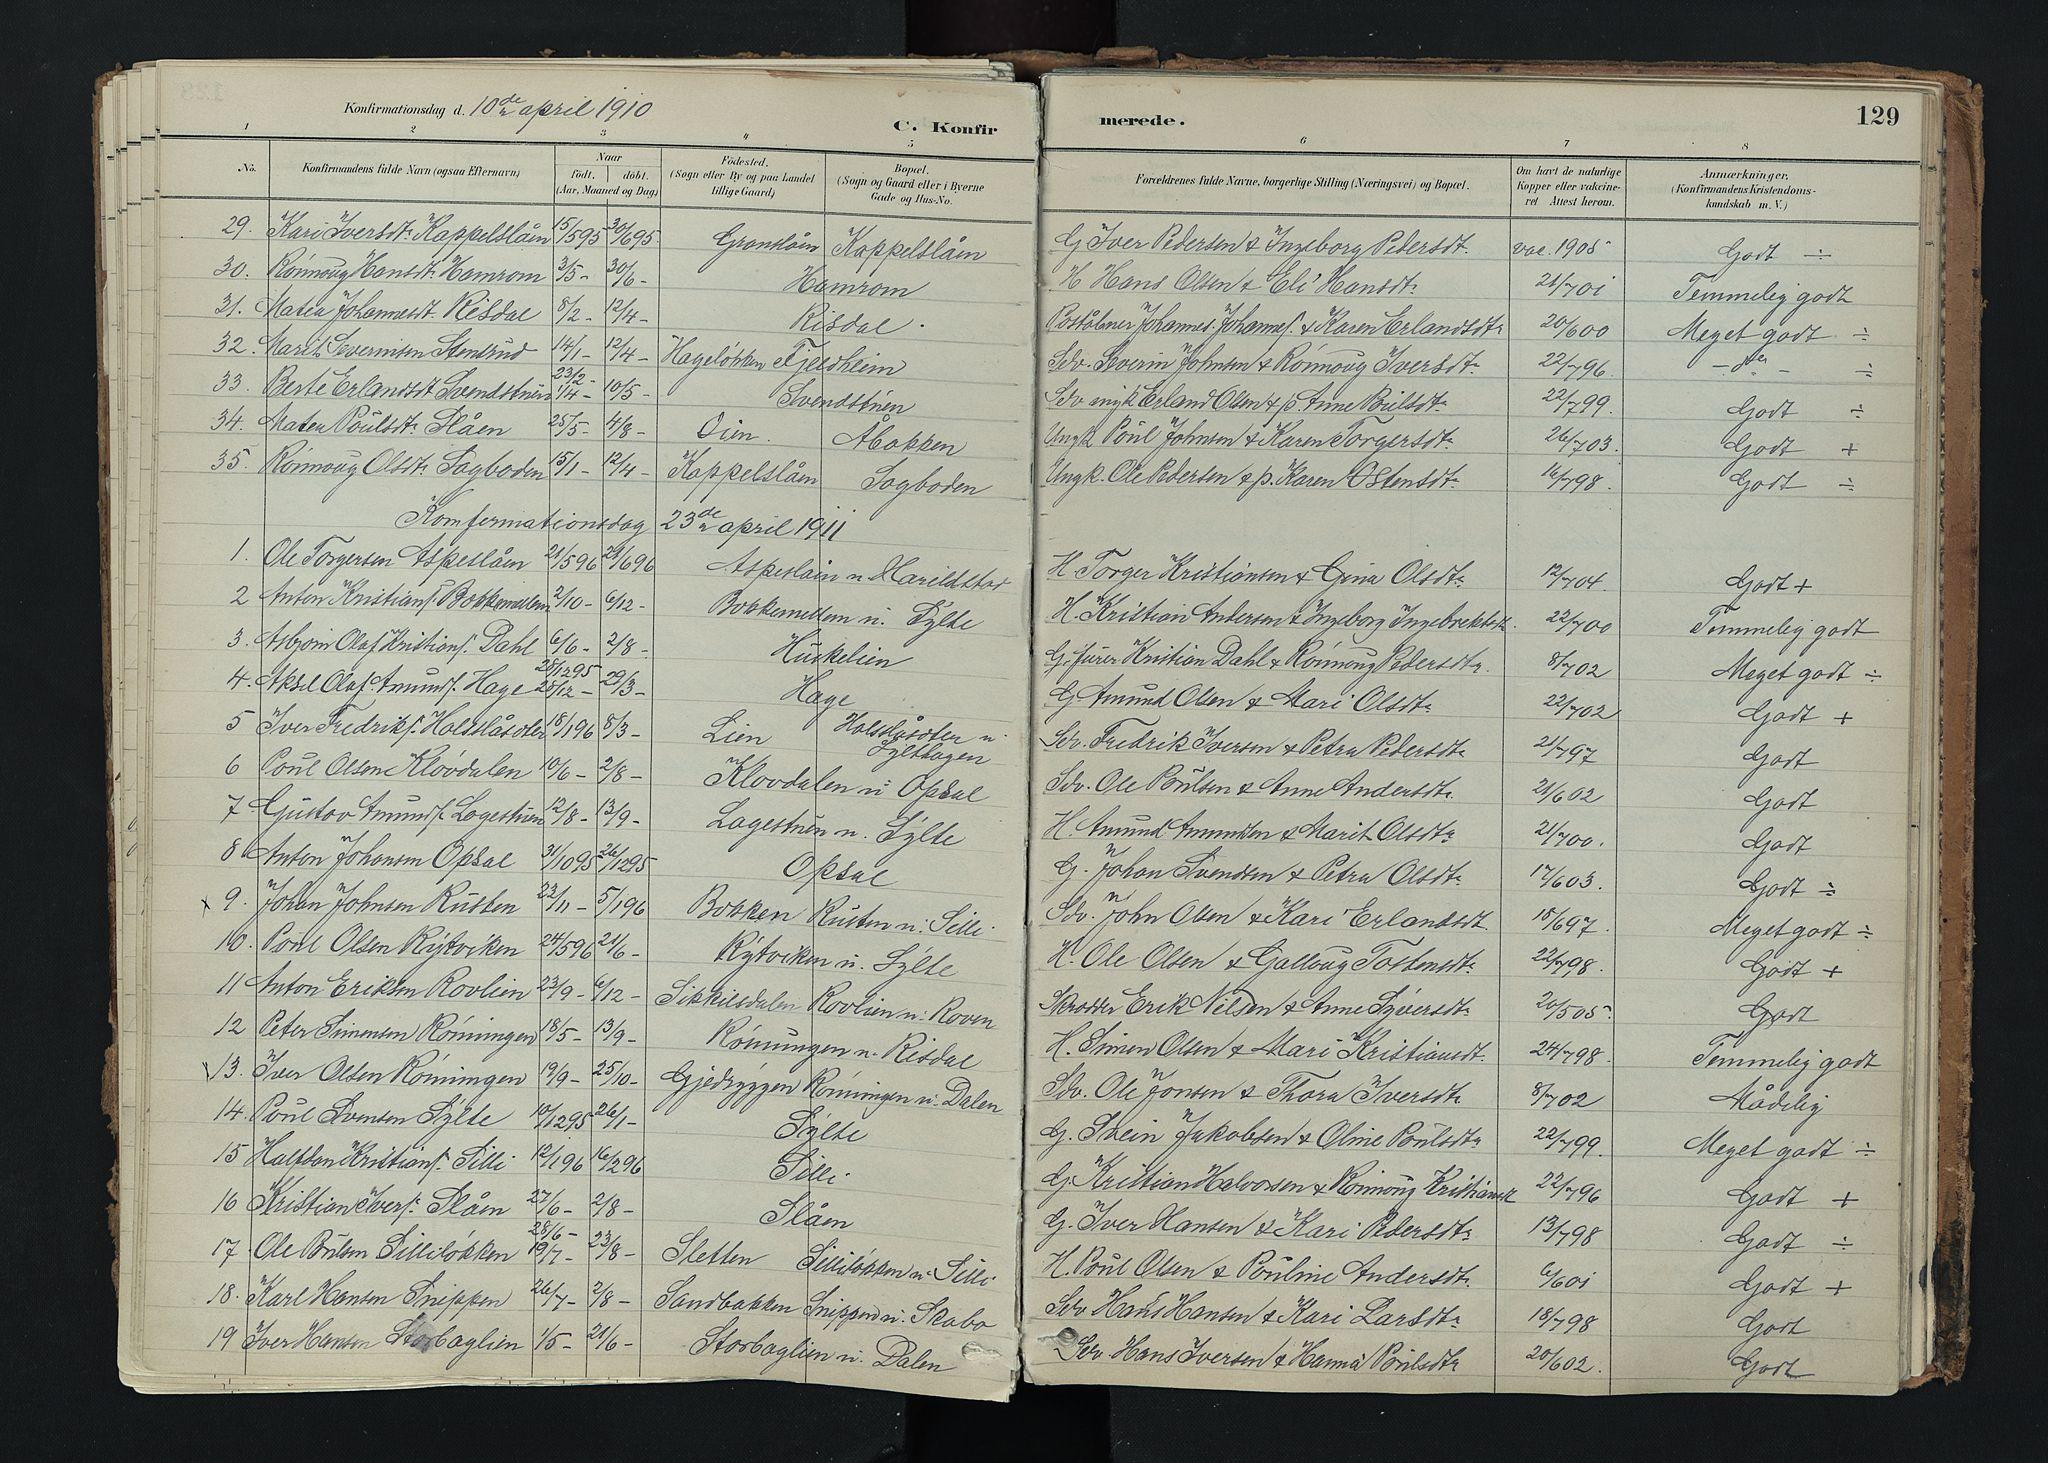 SAH, Nord-Fron prestekontor, Ministerialbok nr. 5, 1884-1914, s. 129